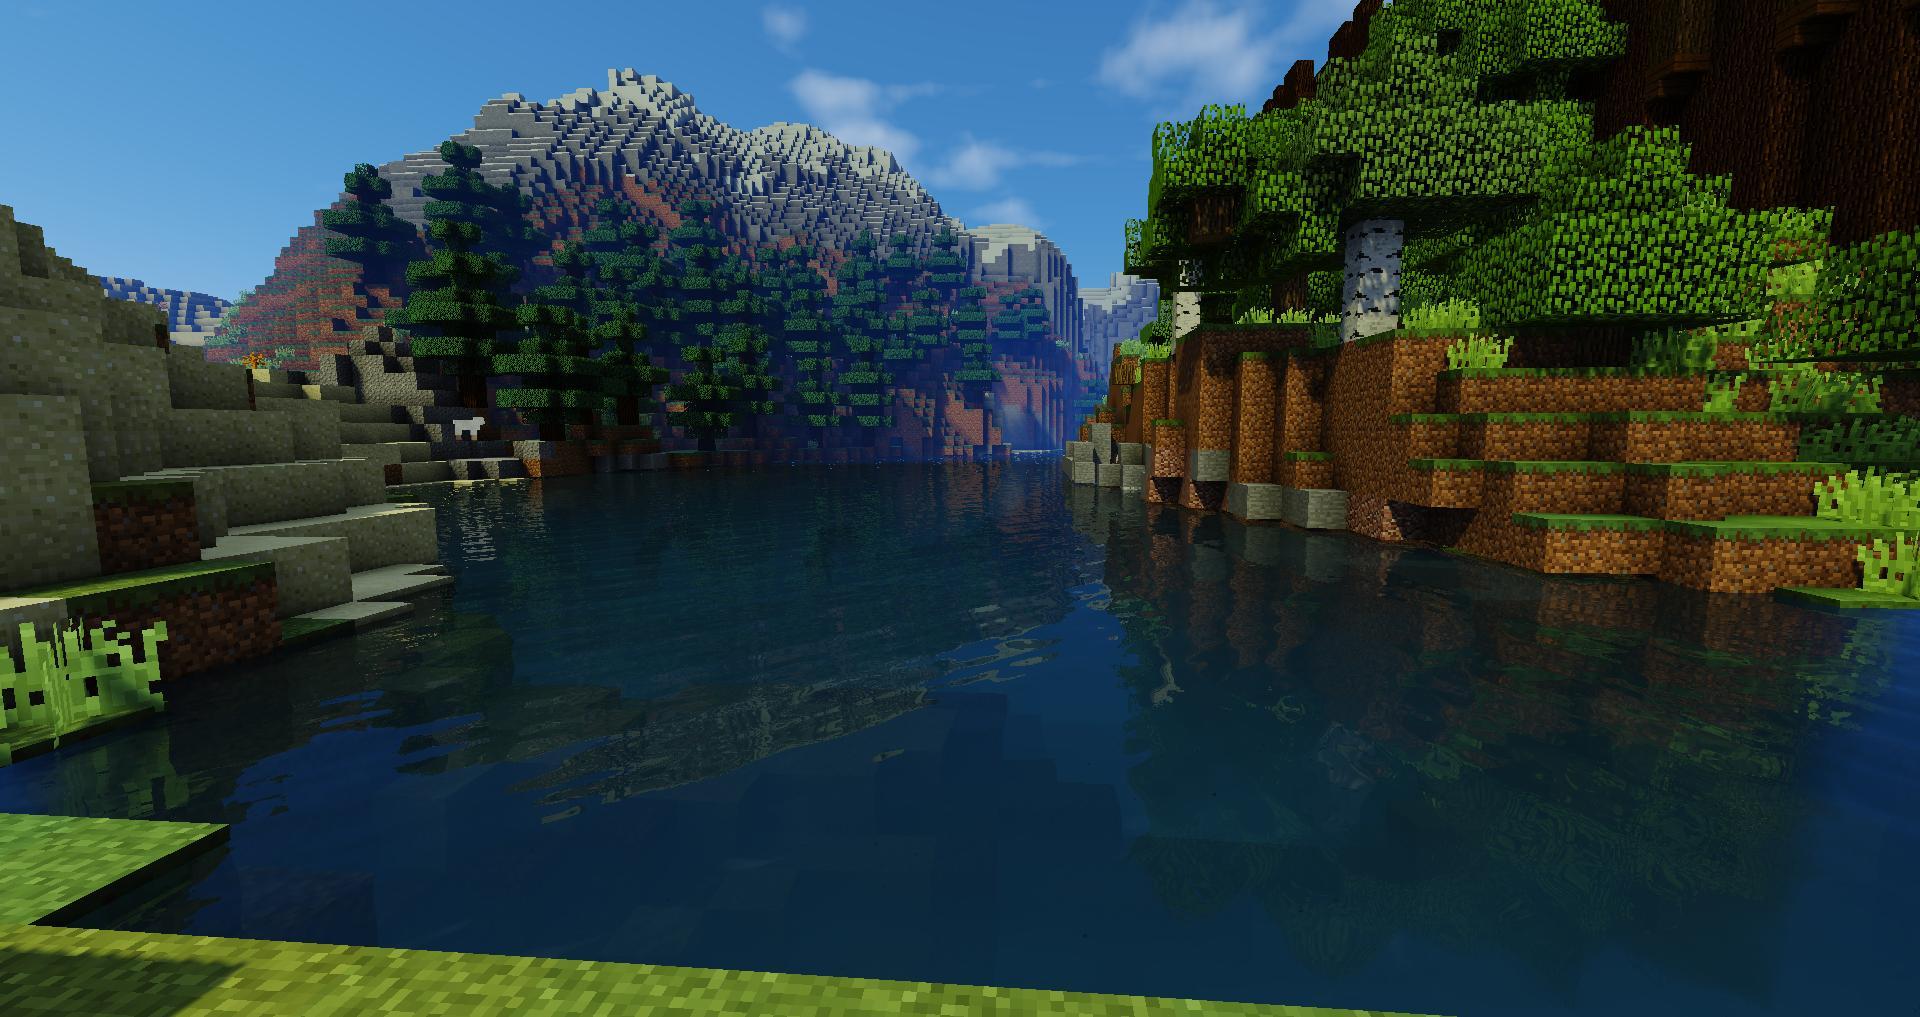 Minecraftの画像 p1_33